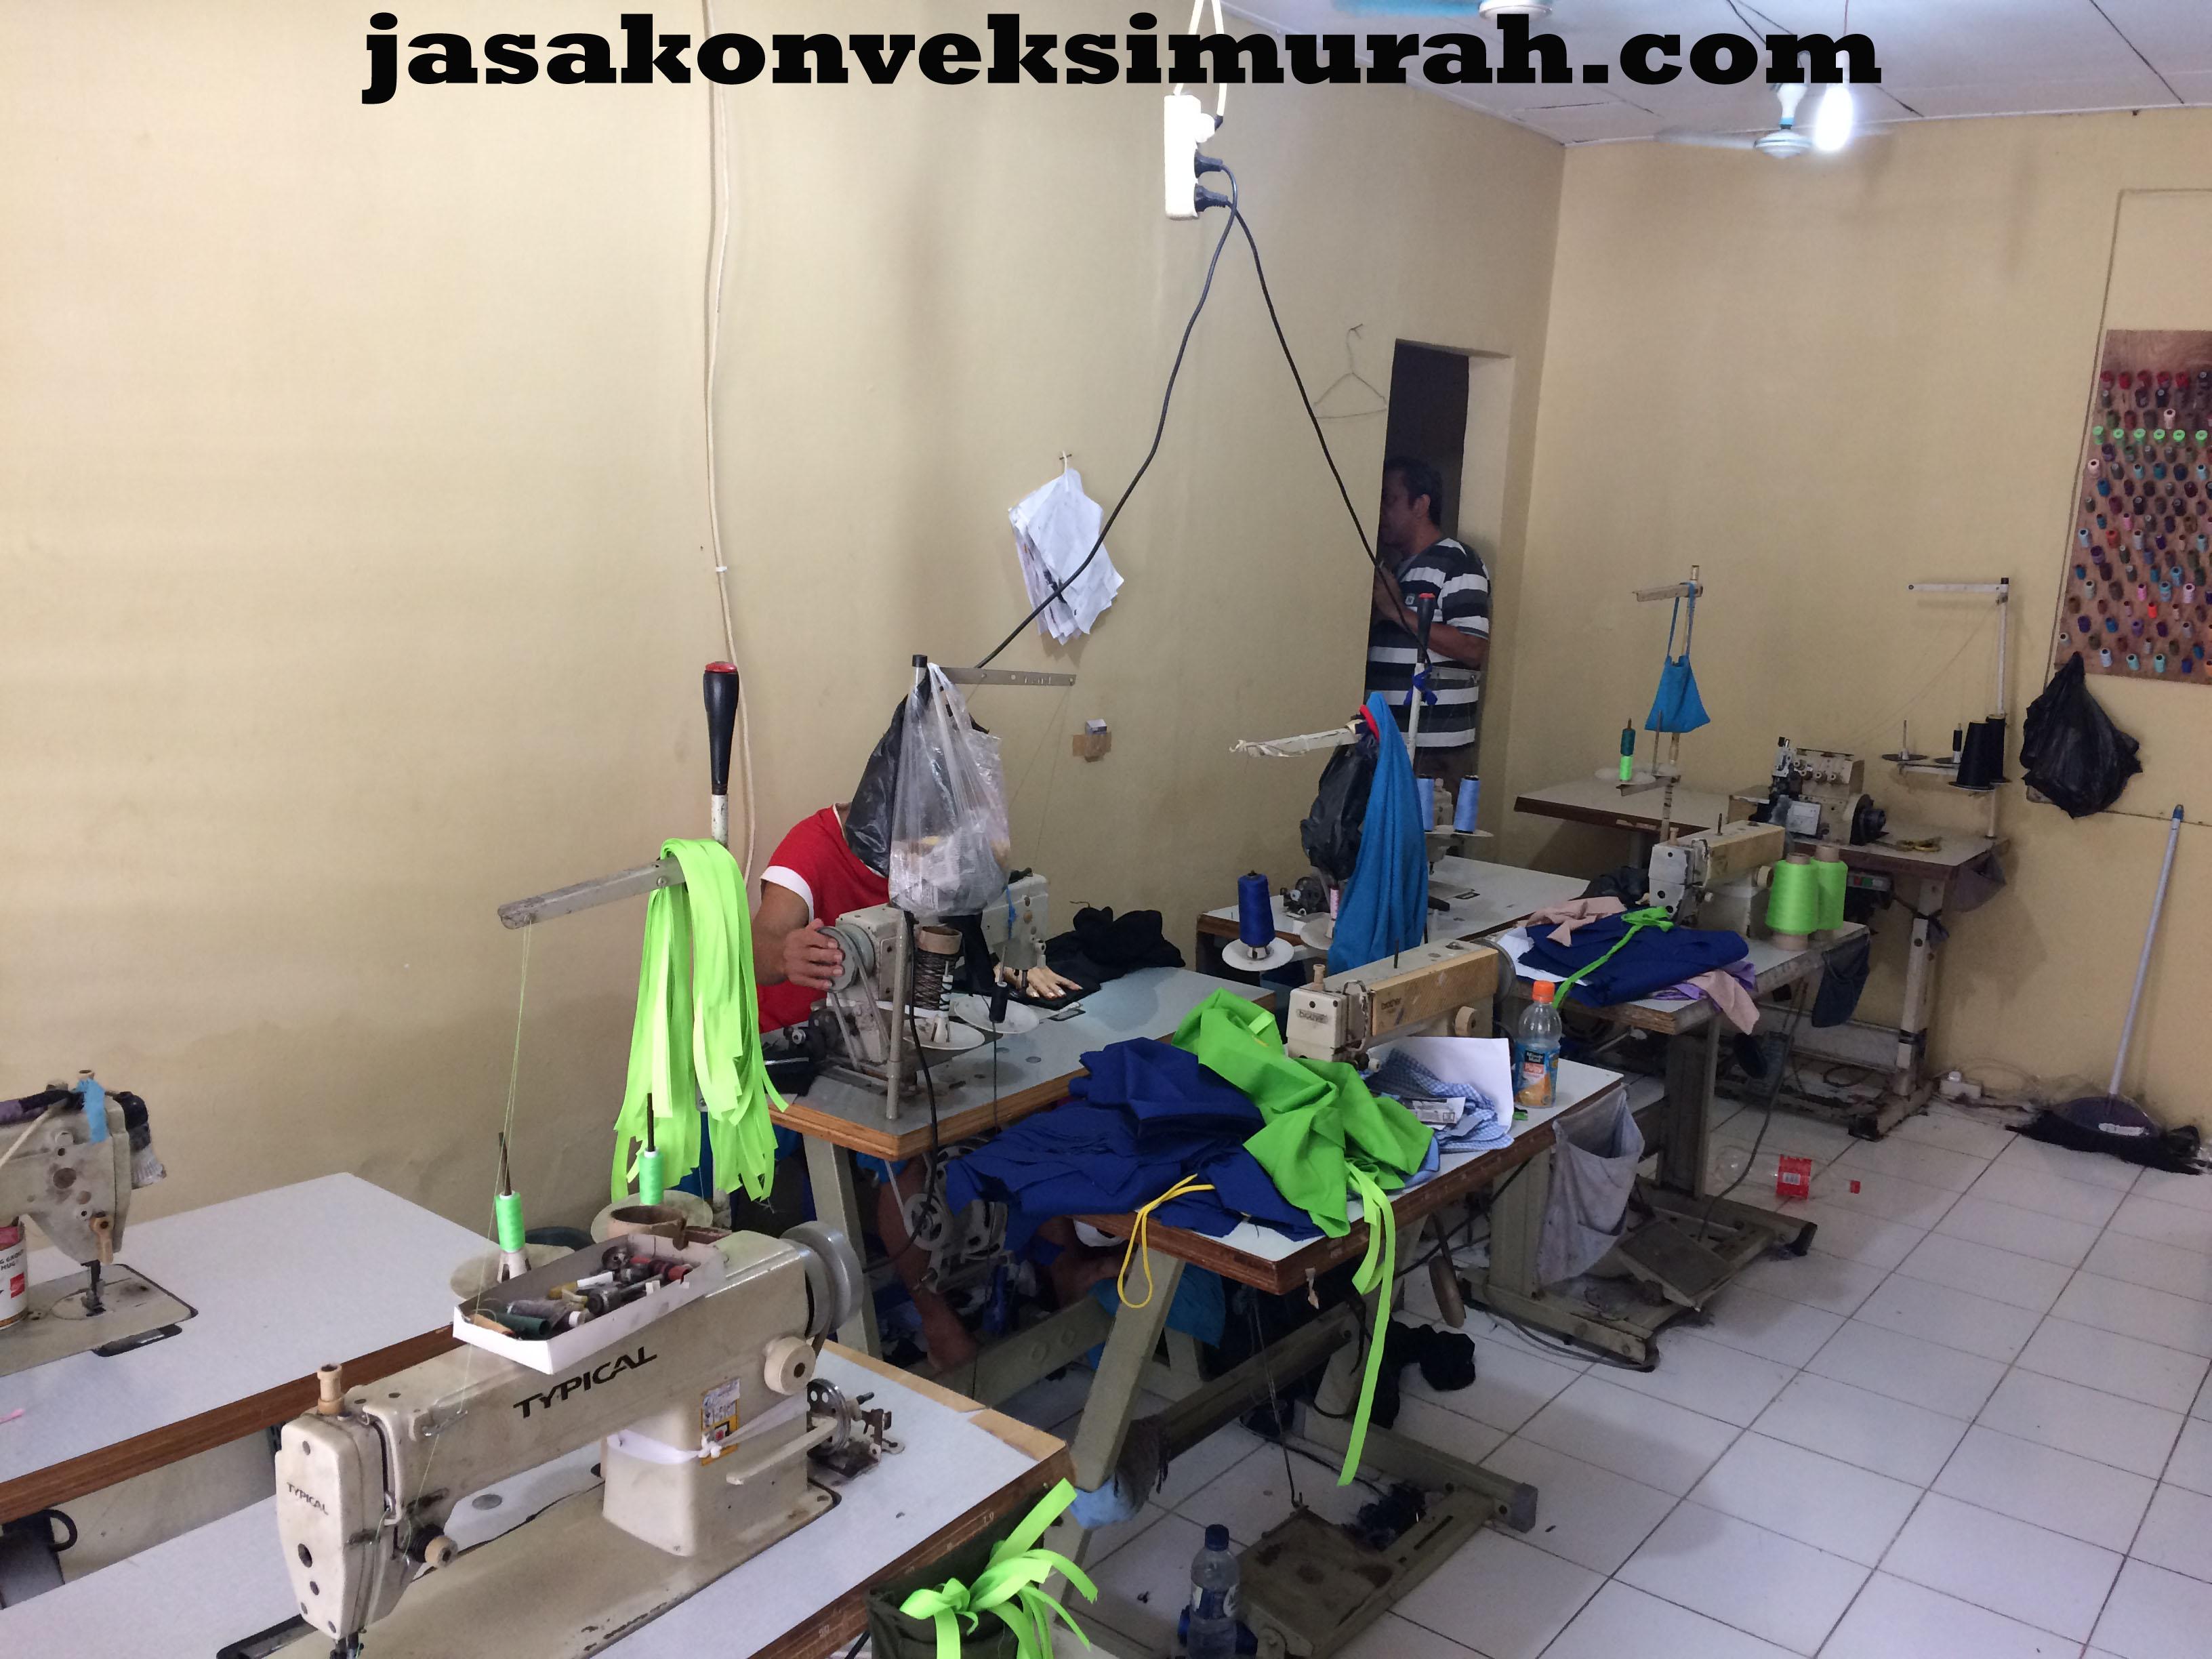 Jasa Konveksi Murah Condet Jakarta Timur